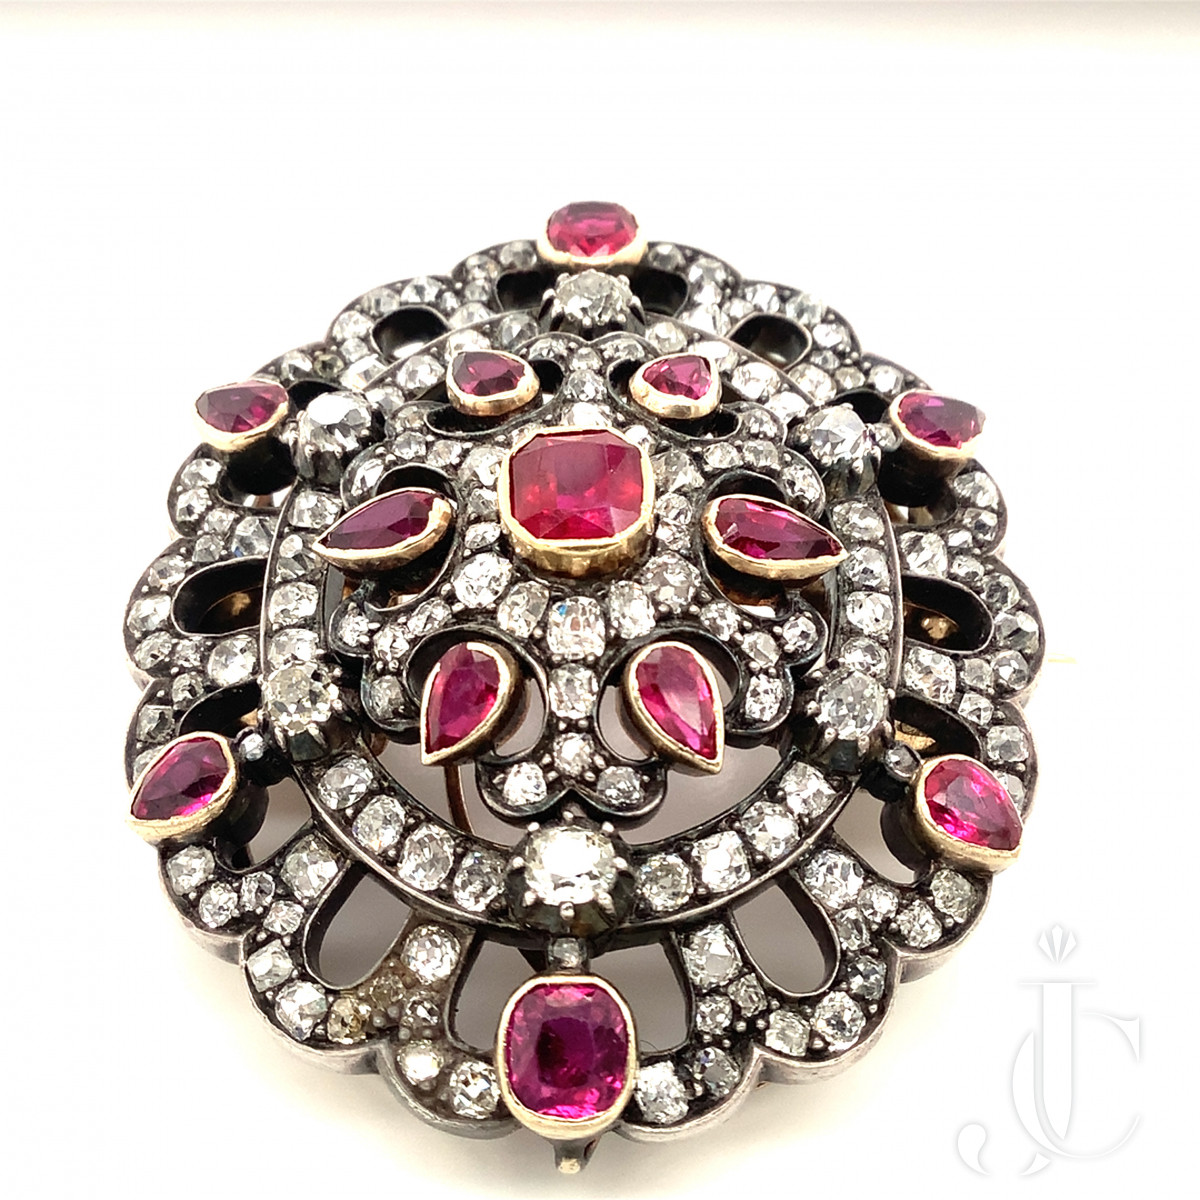 Georgian Diamond and Ruby Brooch